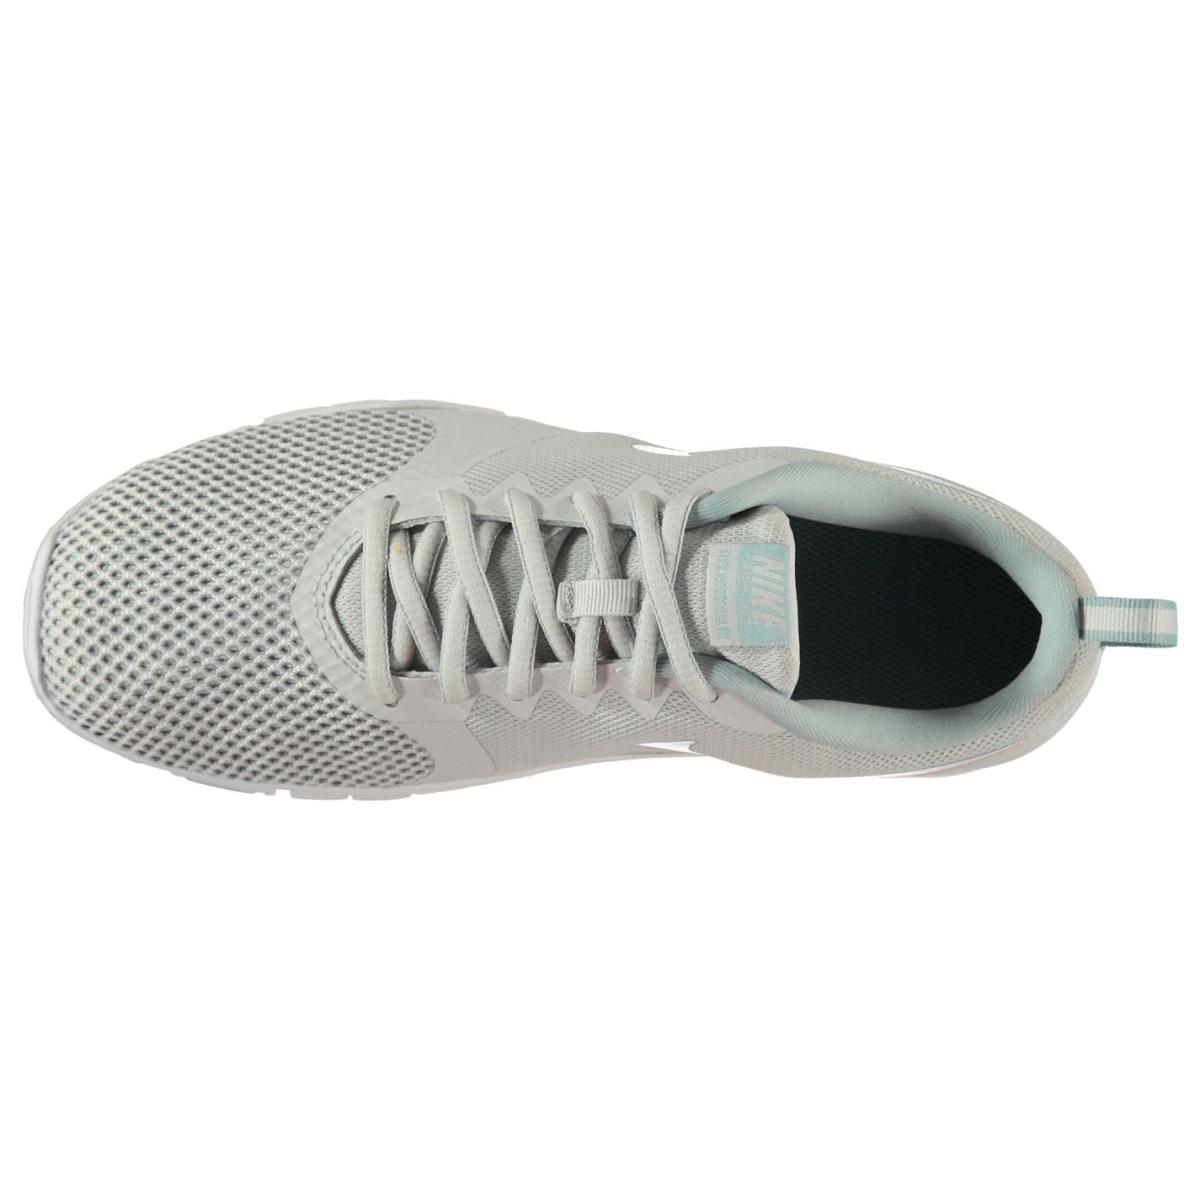 Nike-Flex-Laufschuhe-Turnschuhe-Damen-Sneaker-Sportschuhe-Jogging-3088 Indexbild 25